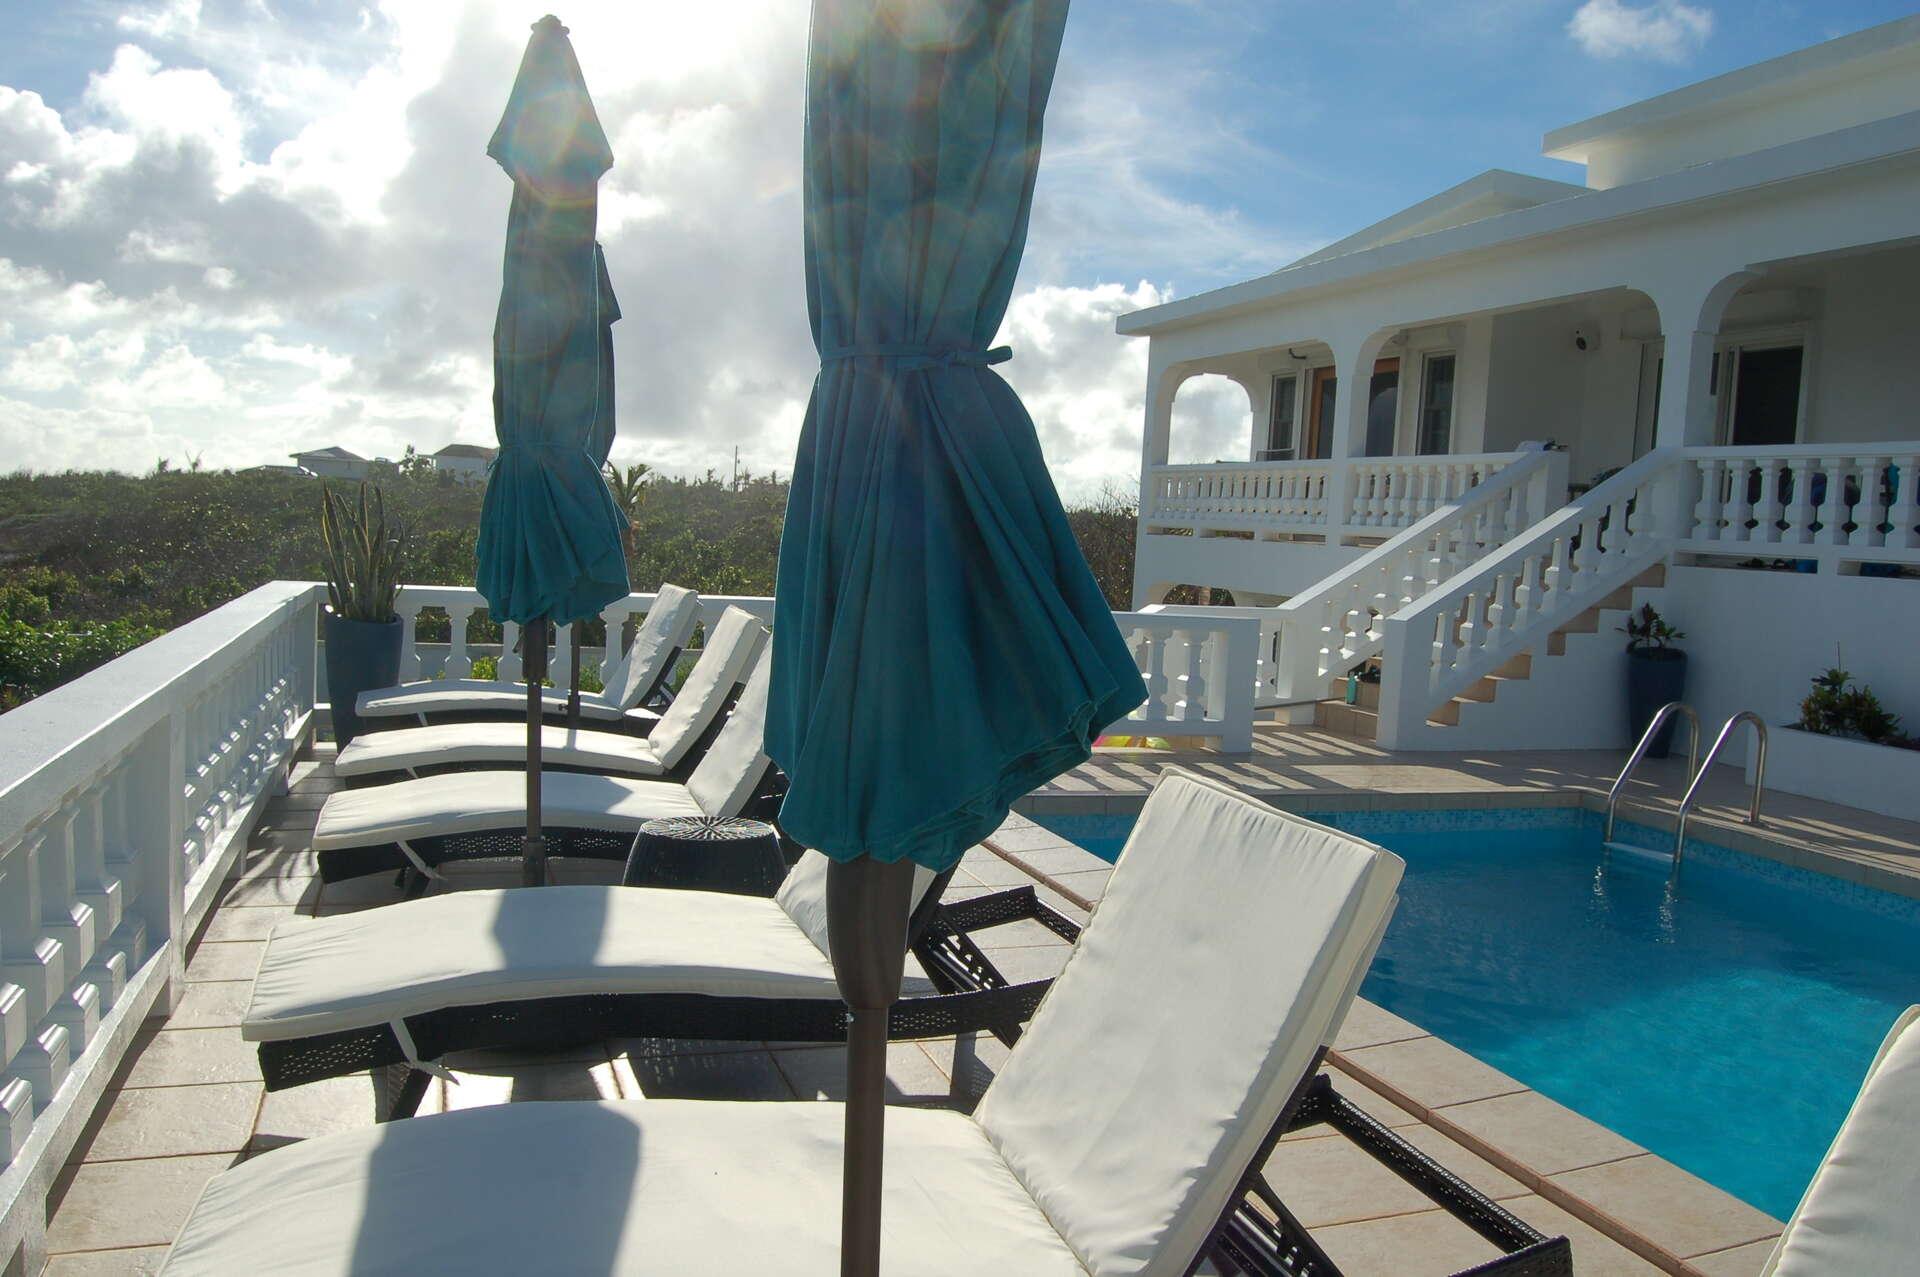 Luxury villa rentals caribbean - Anguilla - Lockrum - Lockrum Point - Image 1/17